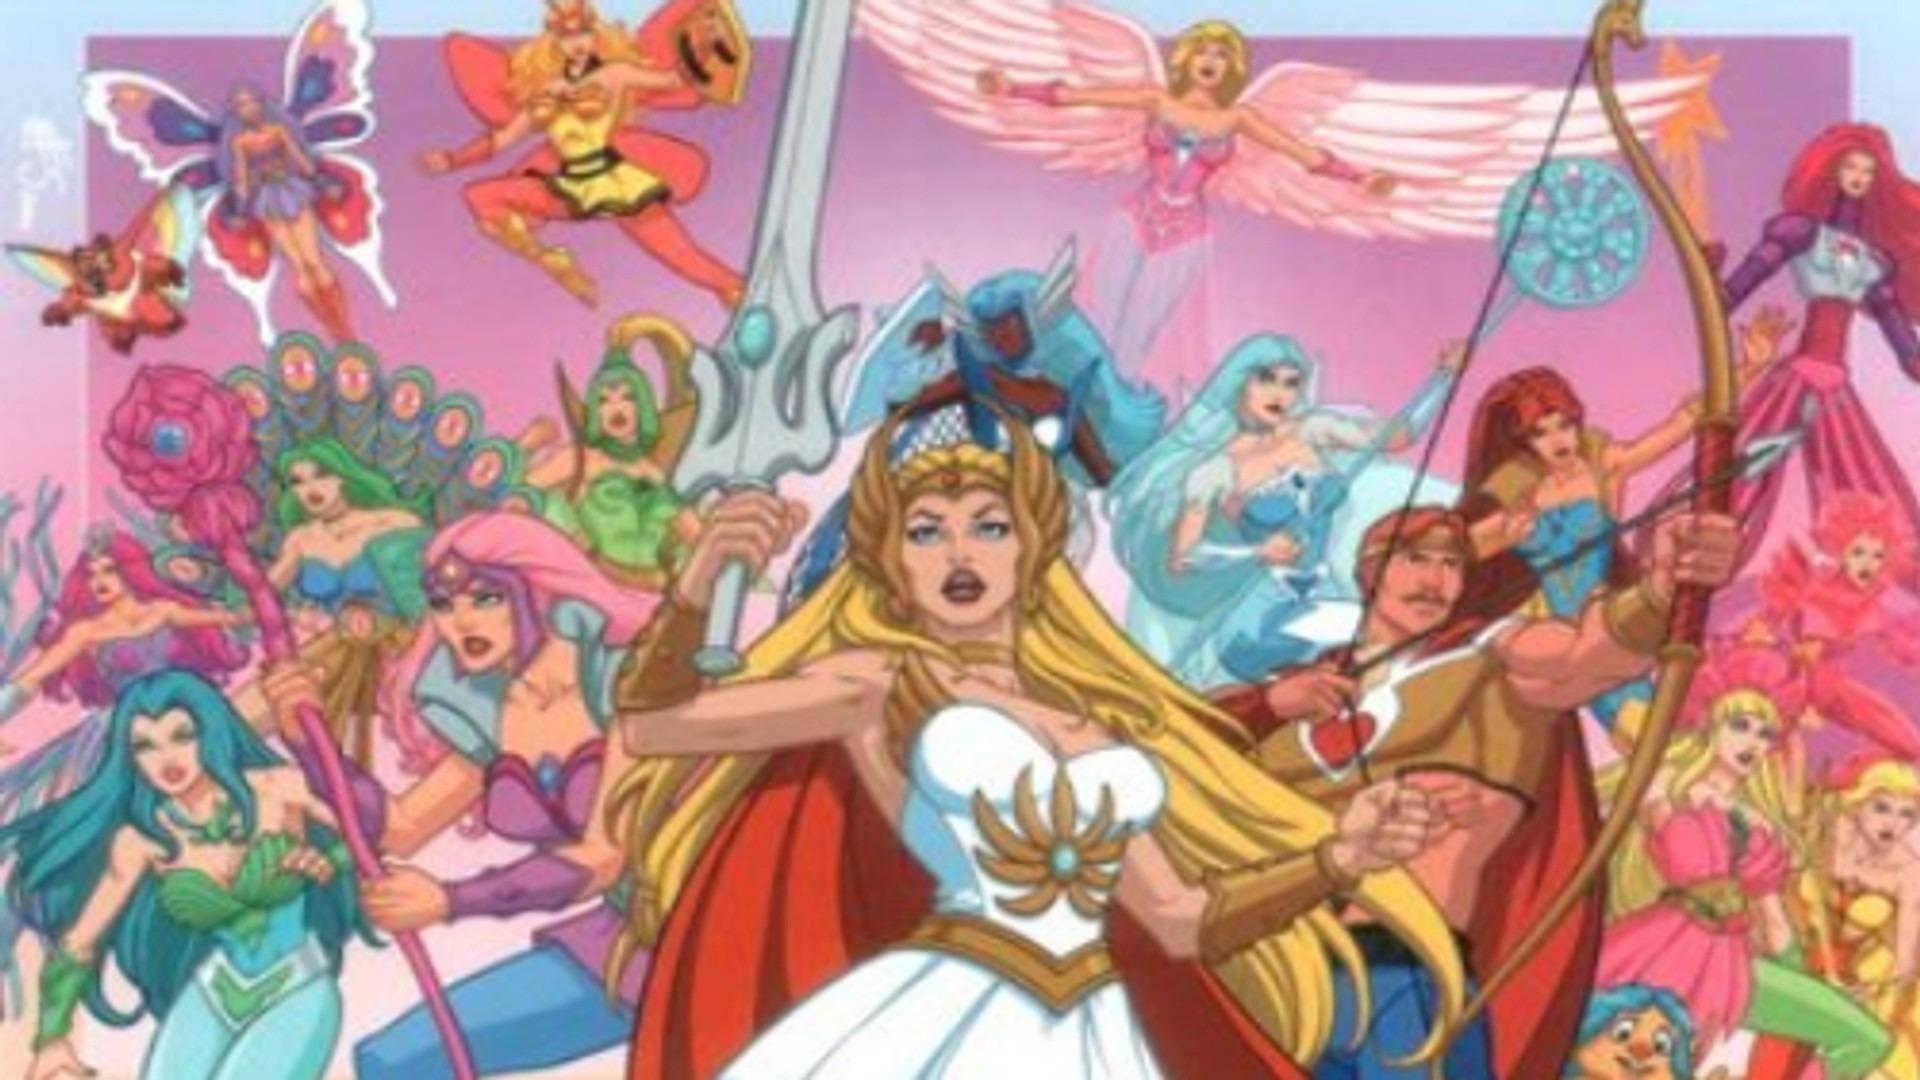 Сериал Принцесса Старла и повелители камней